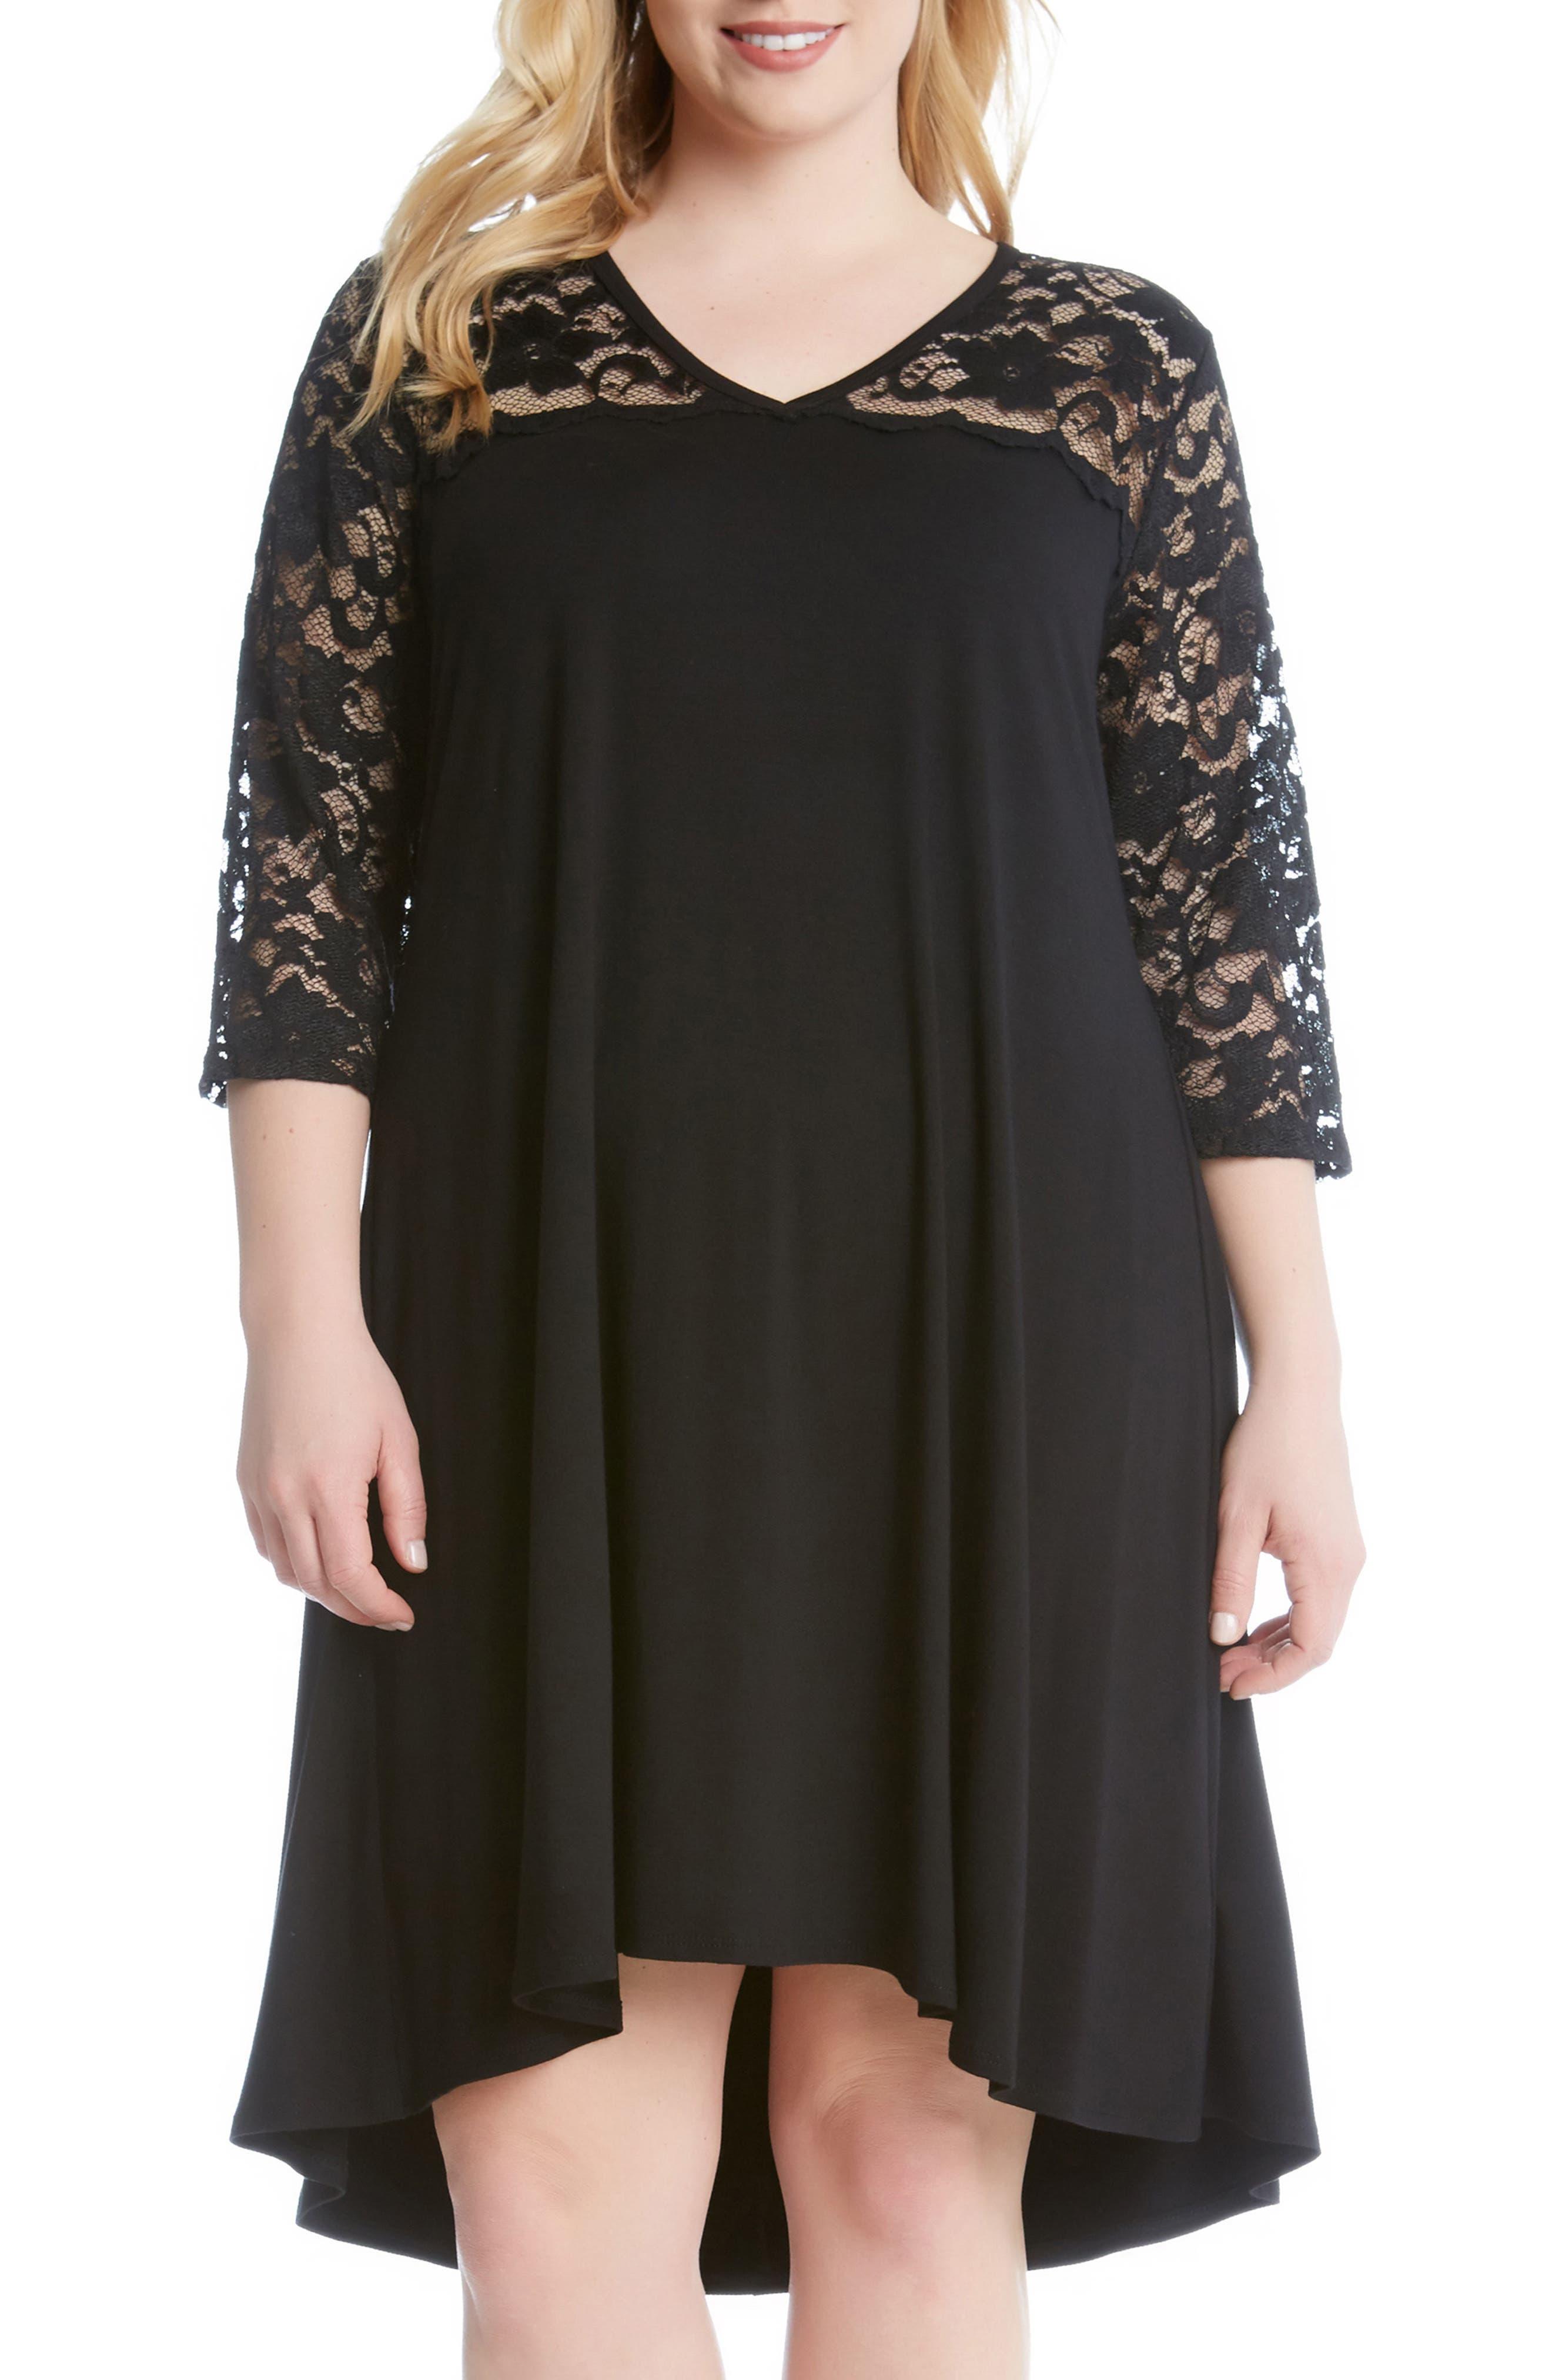 Alternate Image 1 Selected - Karen Kane Lace Yoke Trapeze Dress (Plus Size)